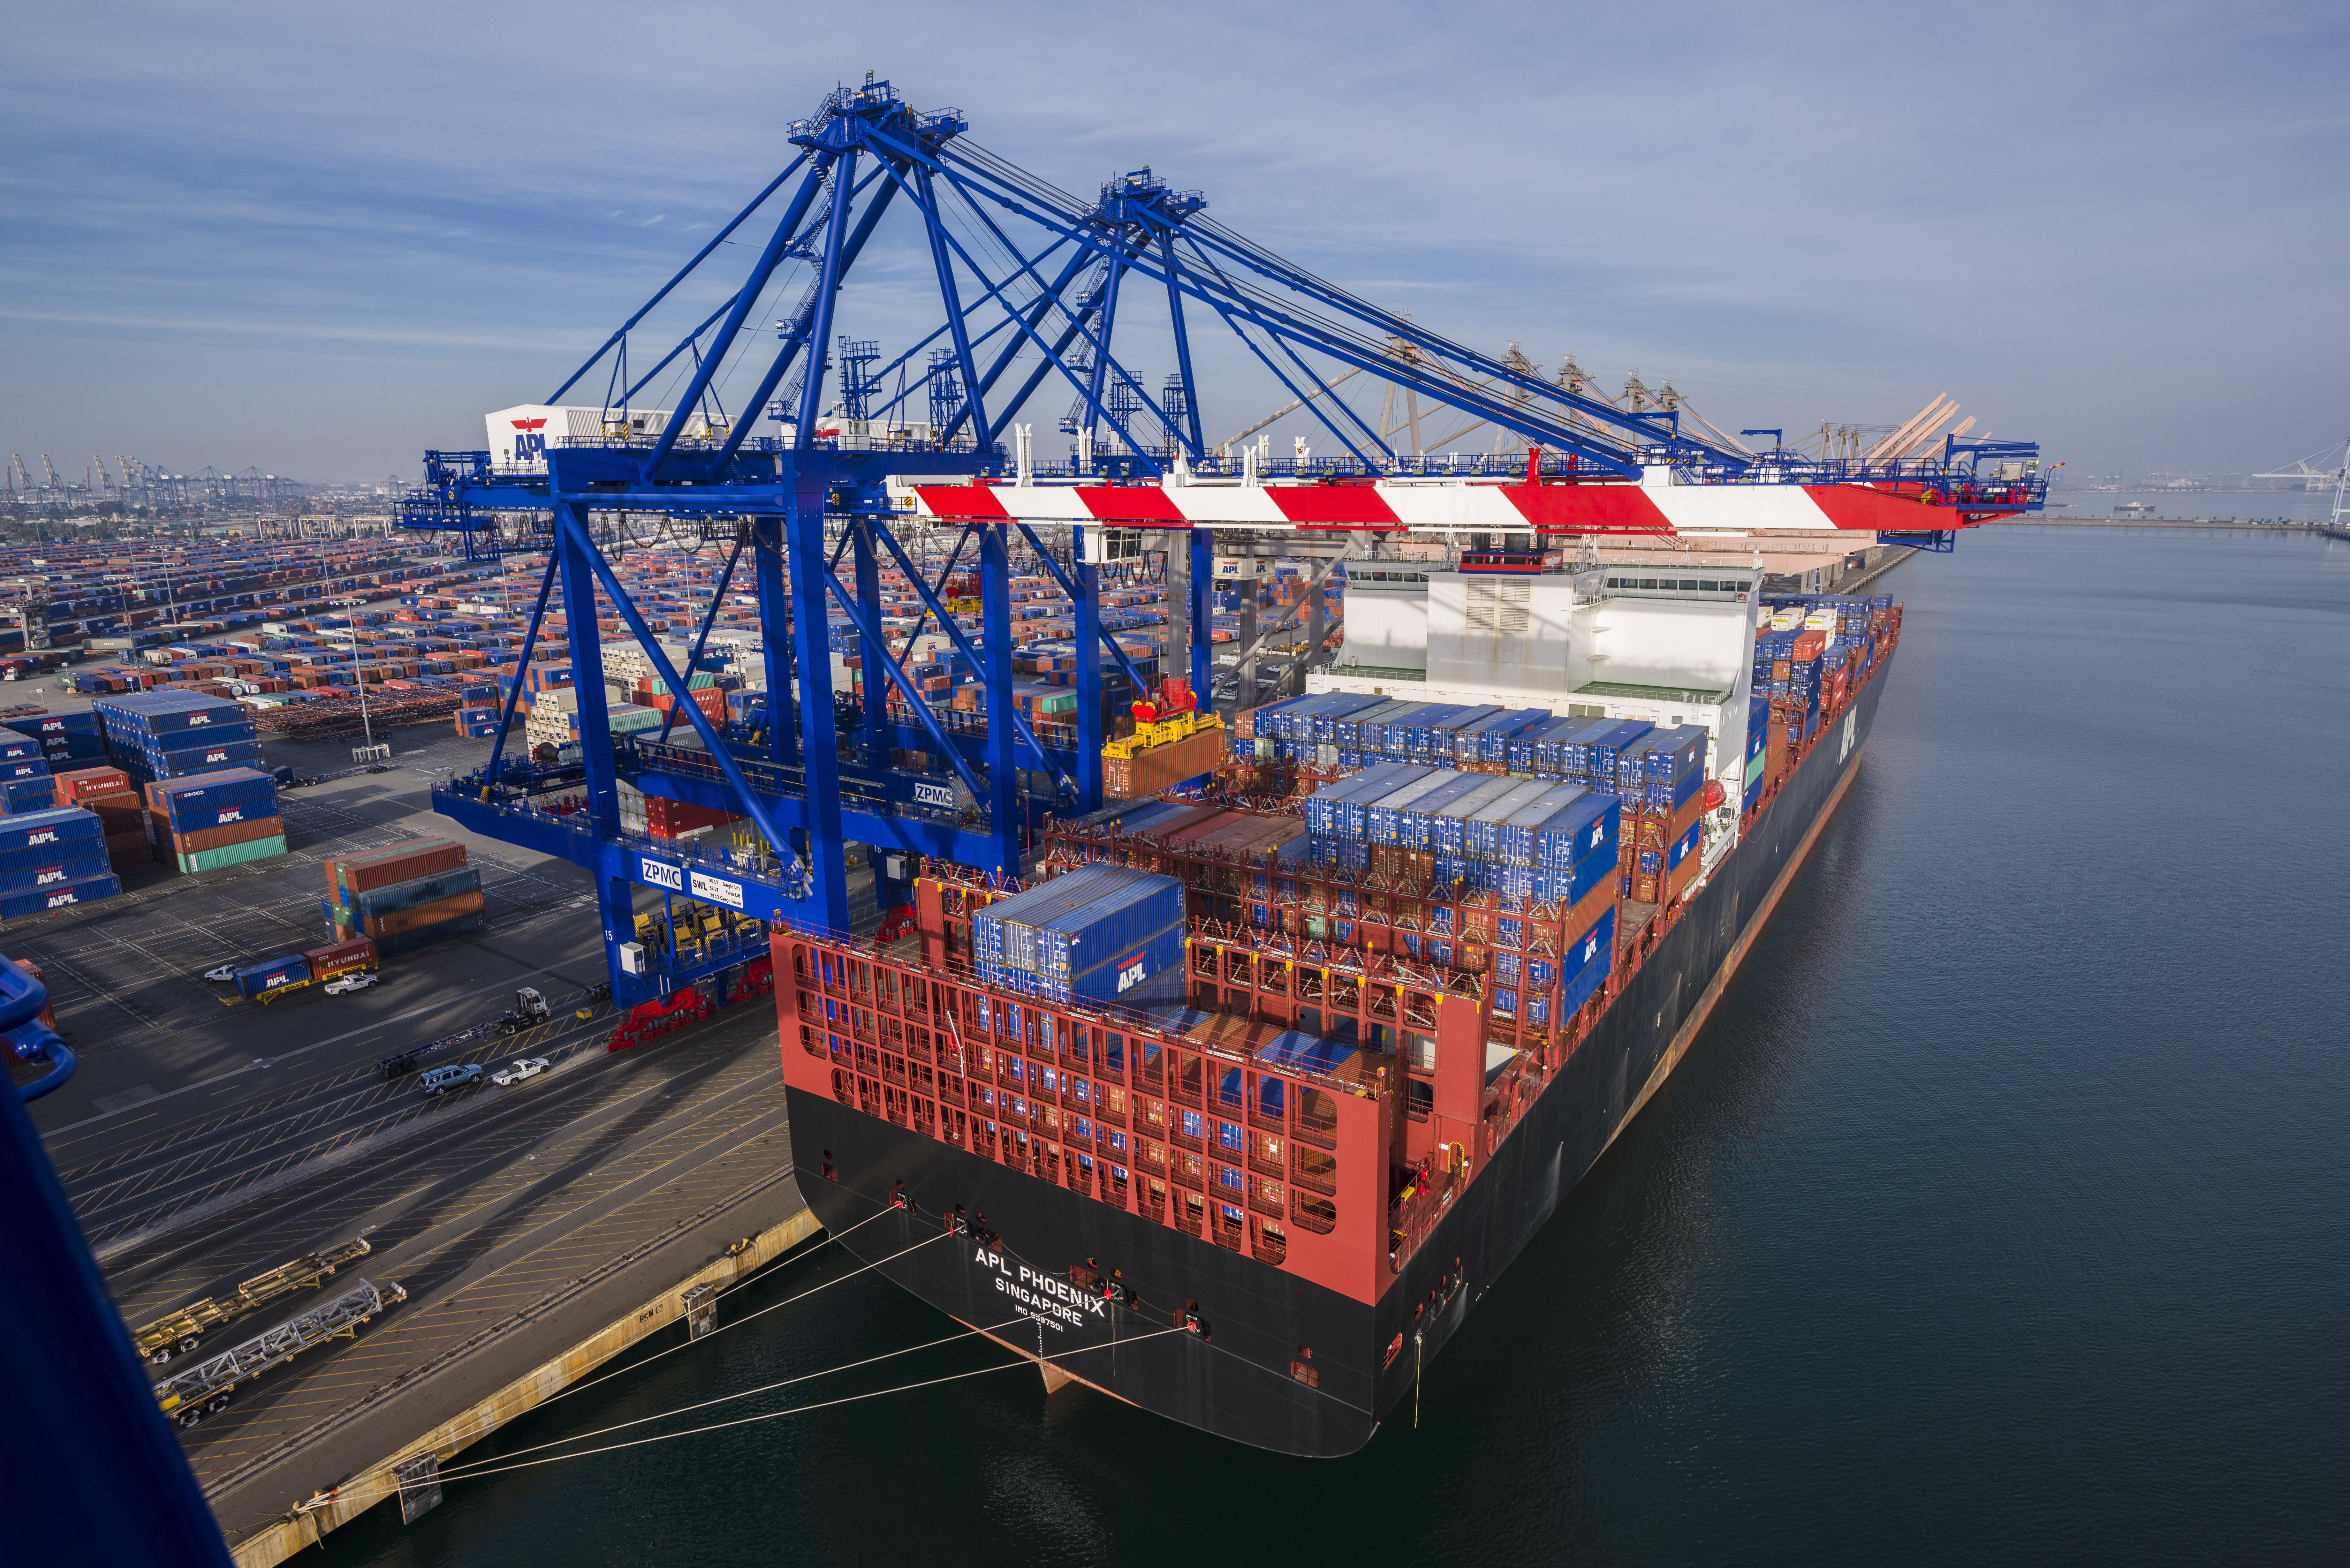 Vessel docked at a shipyard